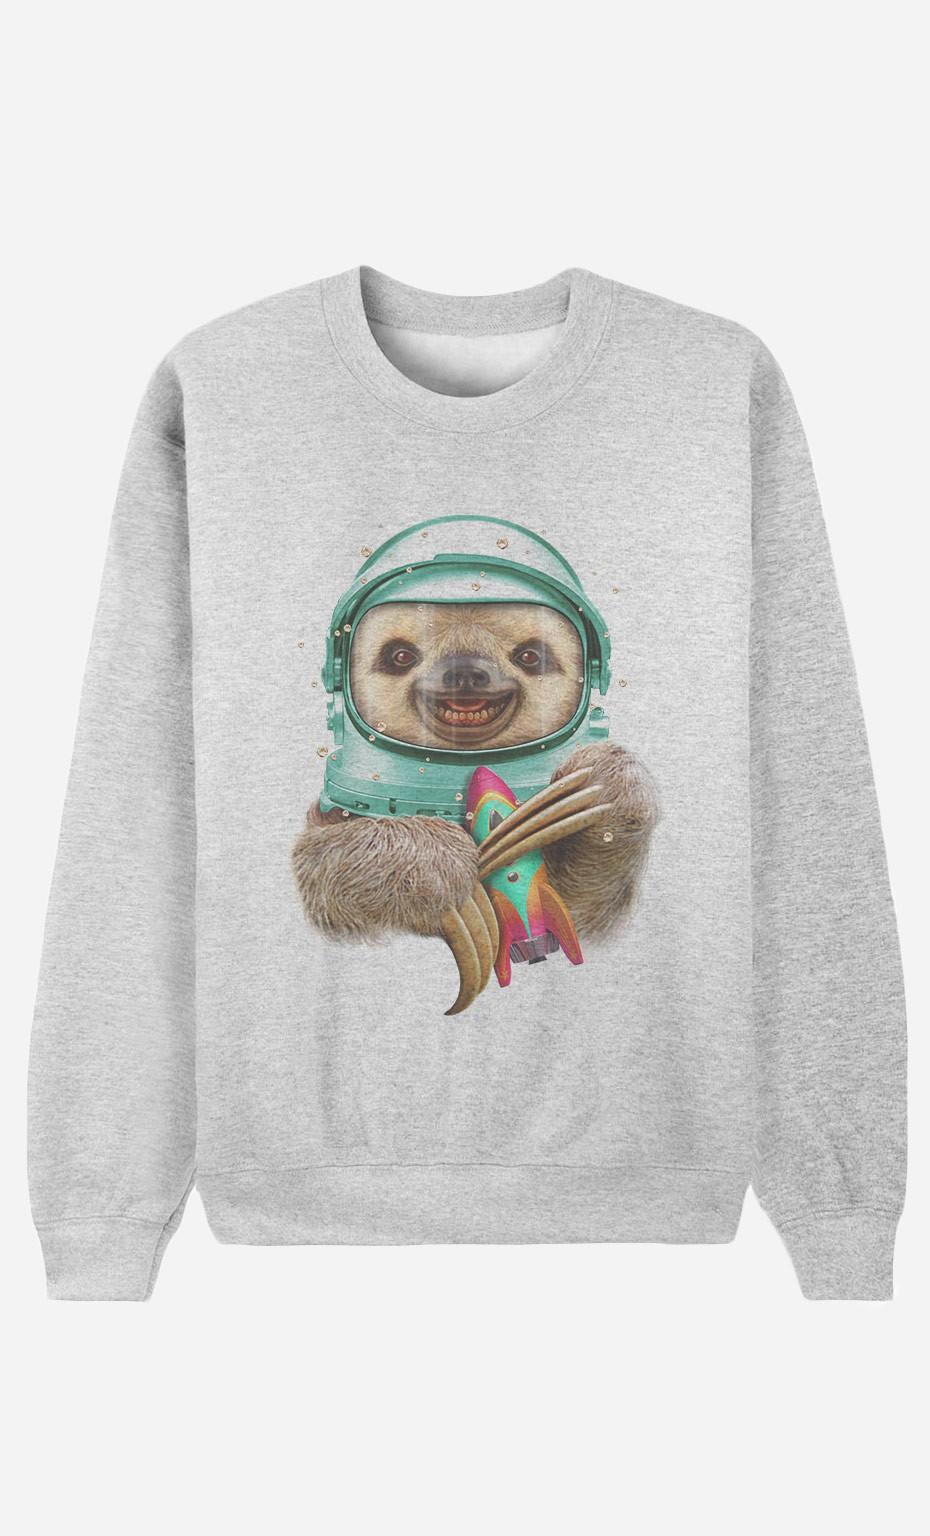 Sweatshirt Space Sloth